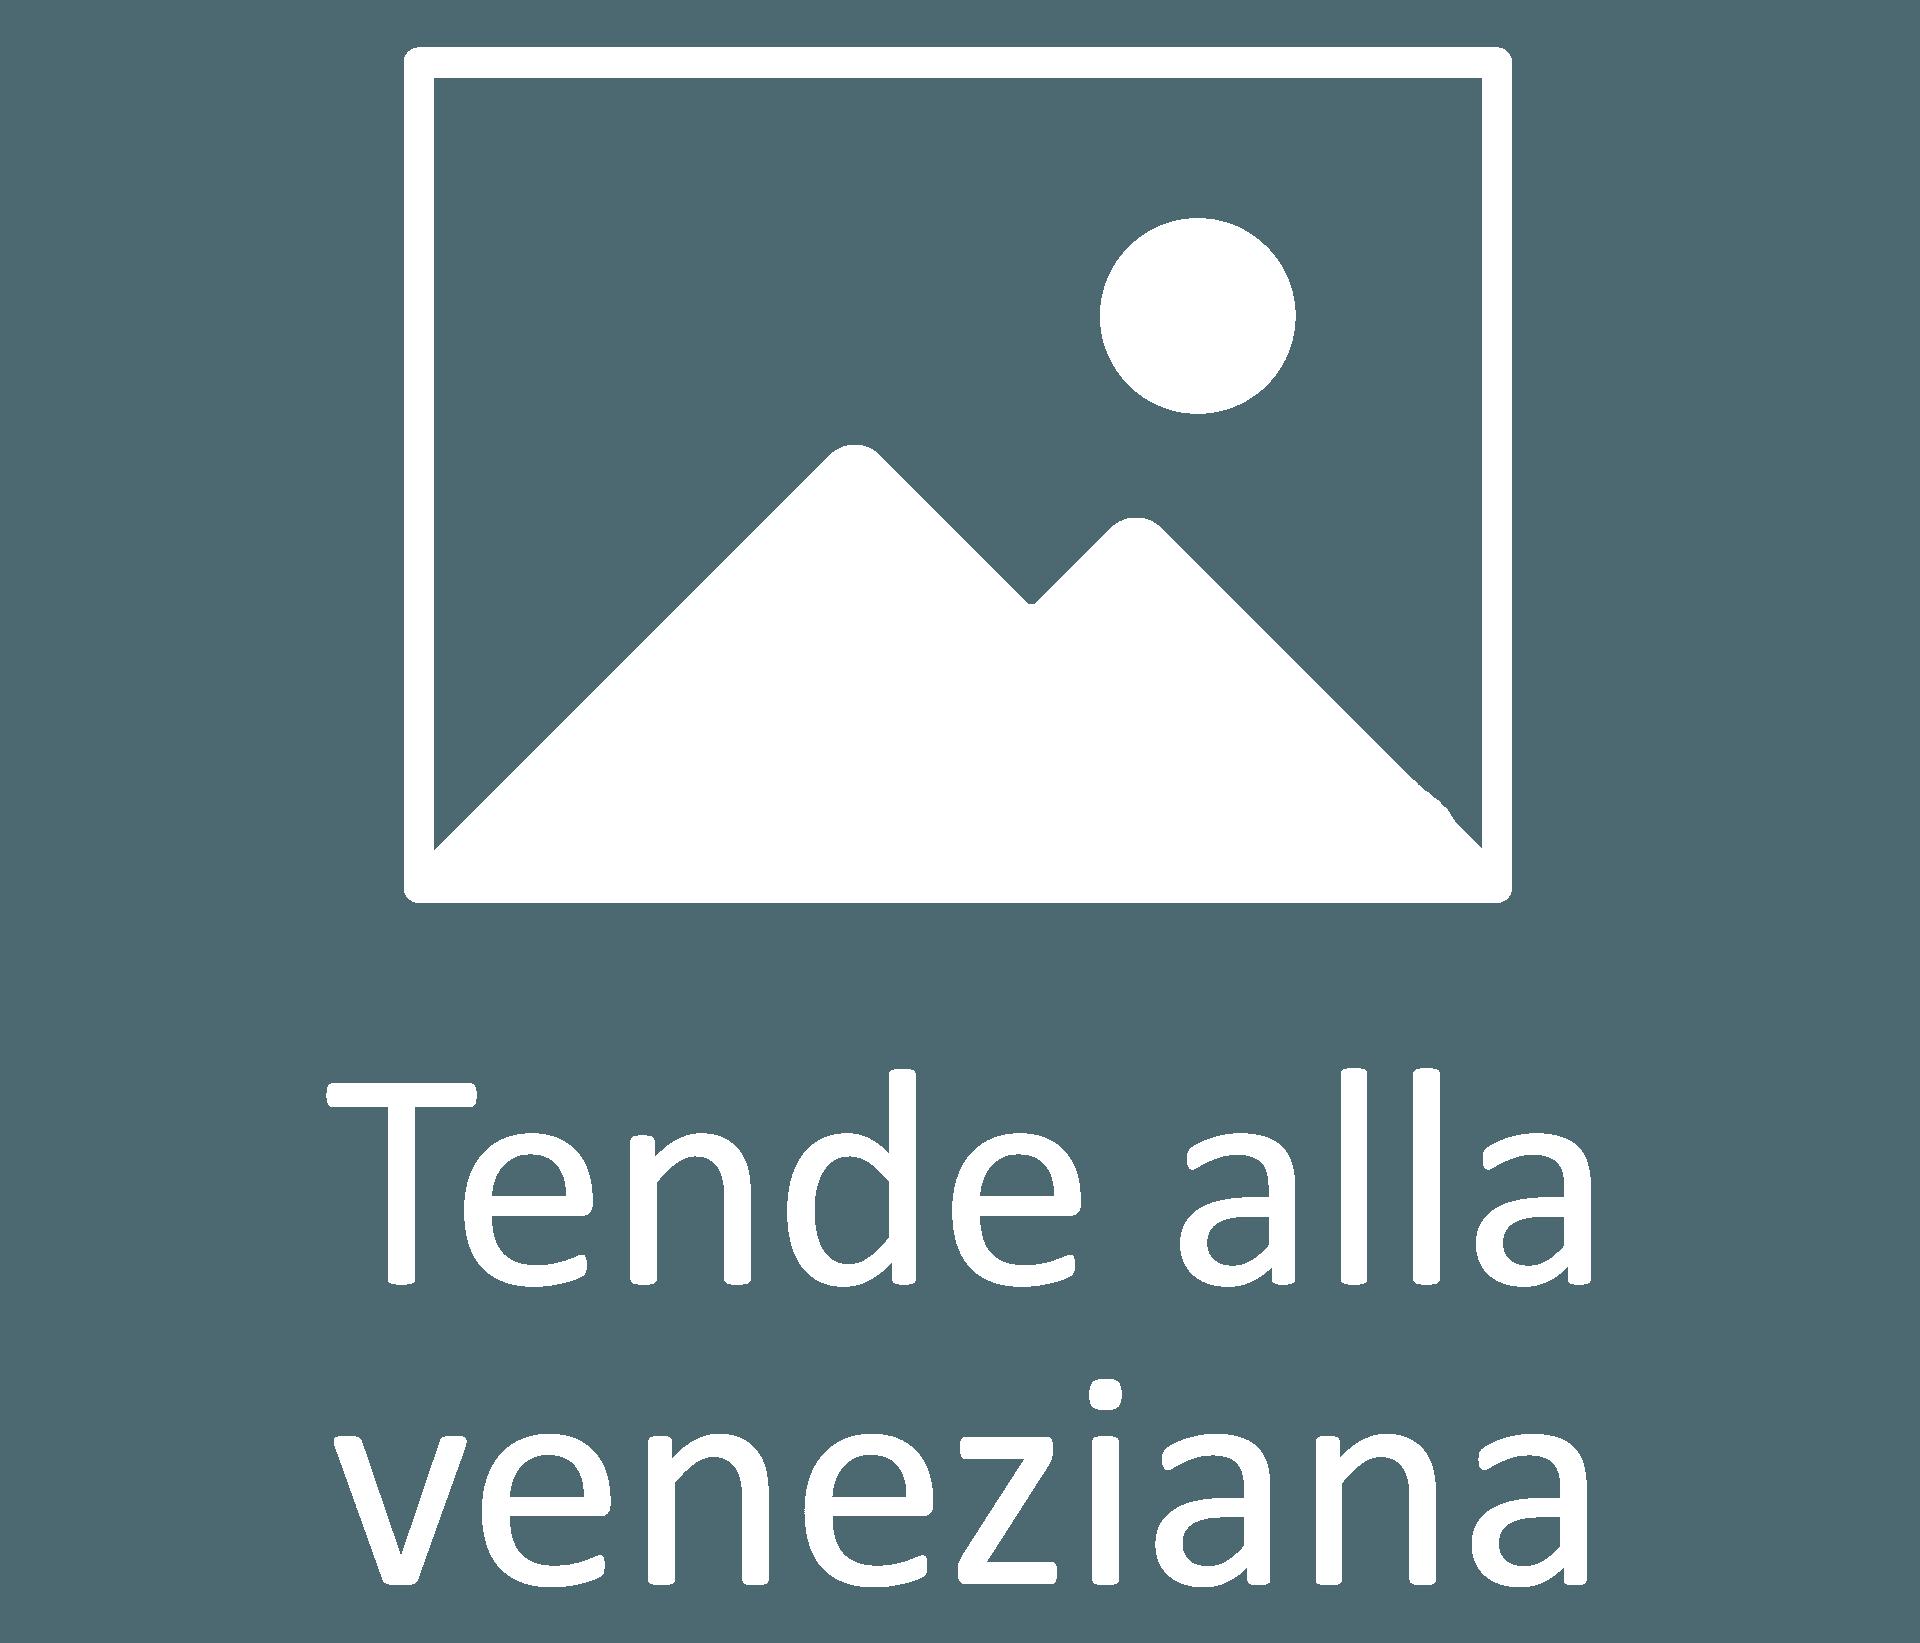 tende alla veneziana